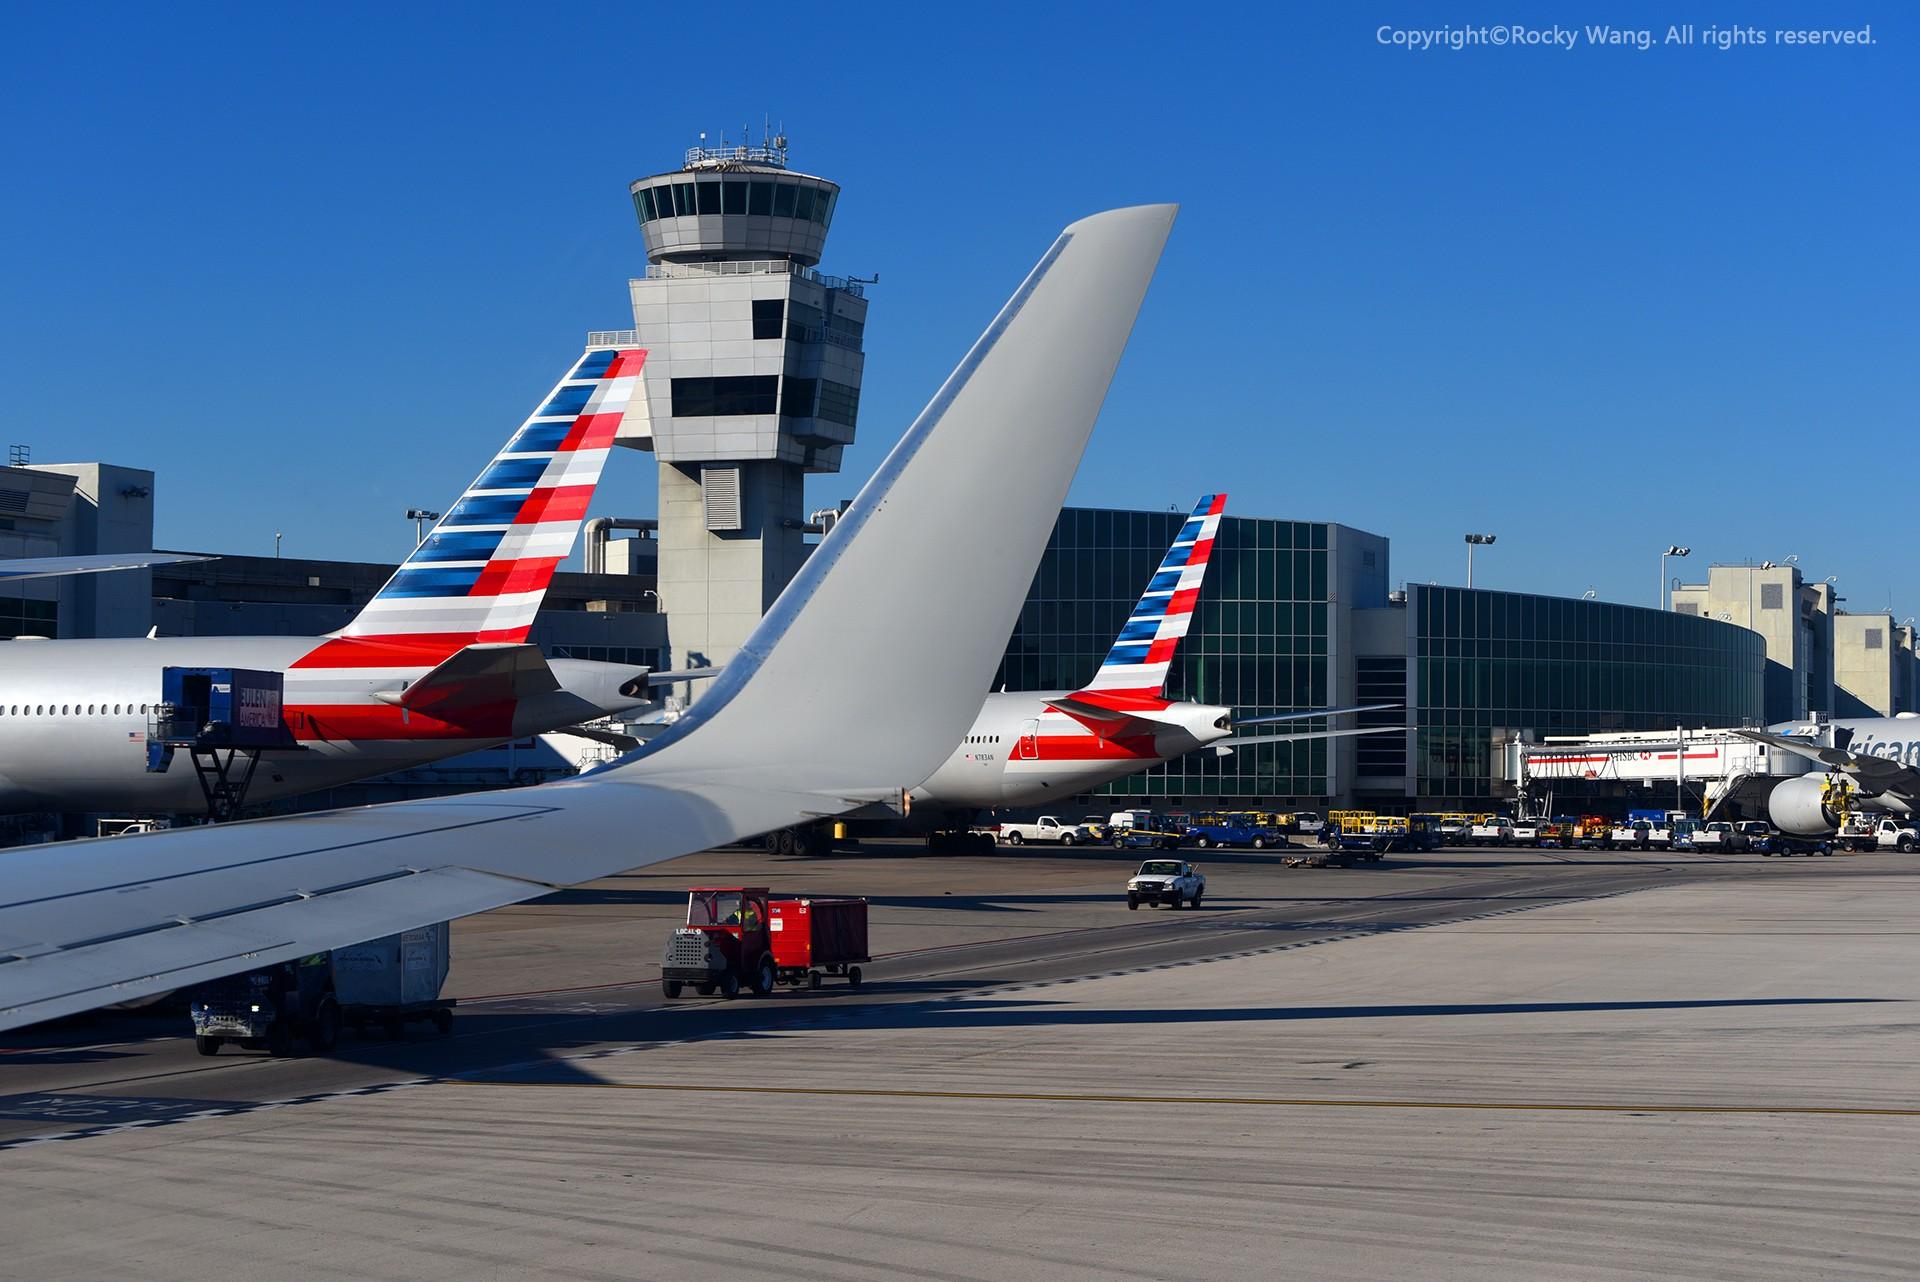 Re:[原创]简易版游记,纪念一次30段的环球飞行和一些碎碎念 BOEING 737-823 N876NN Miami Int'l Airport